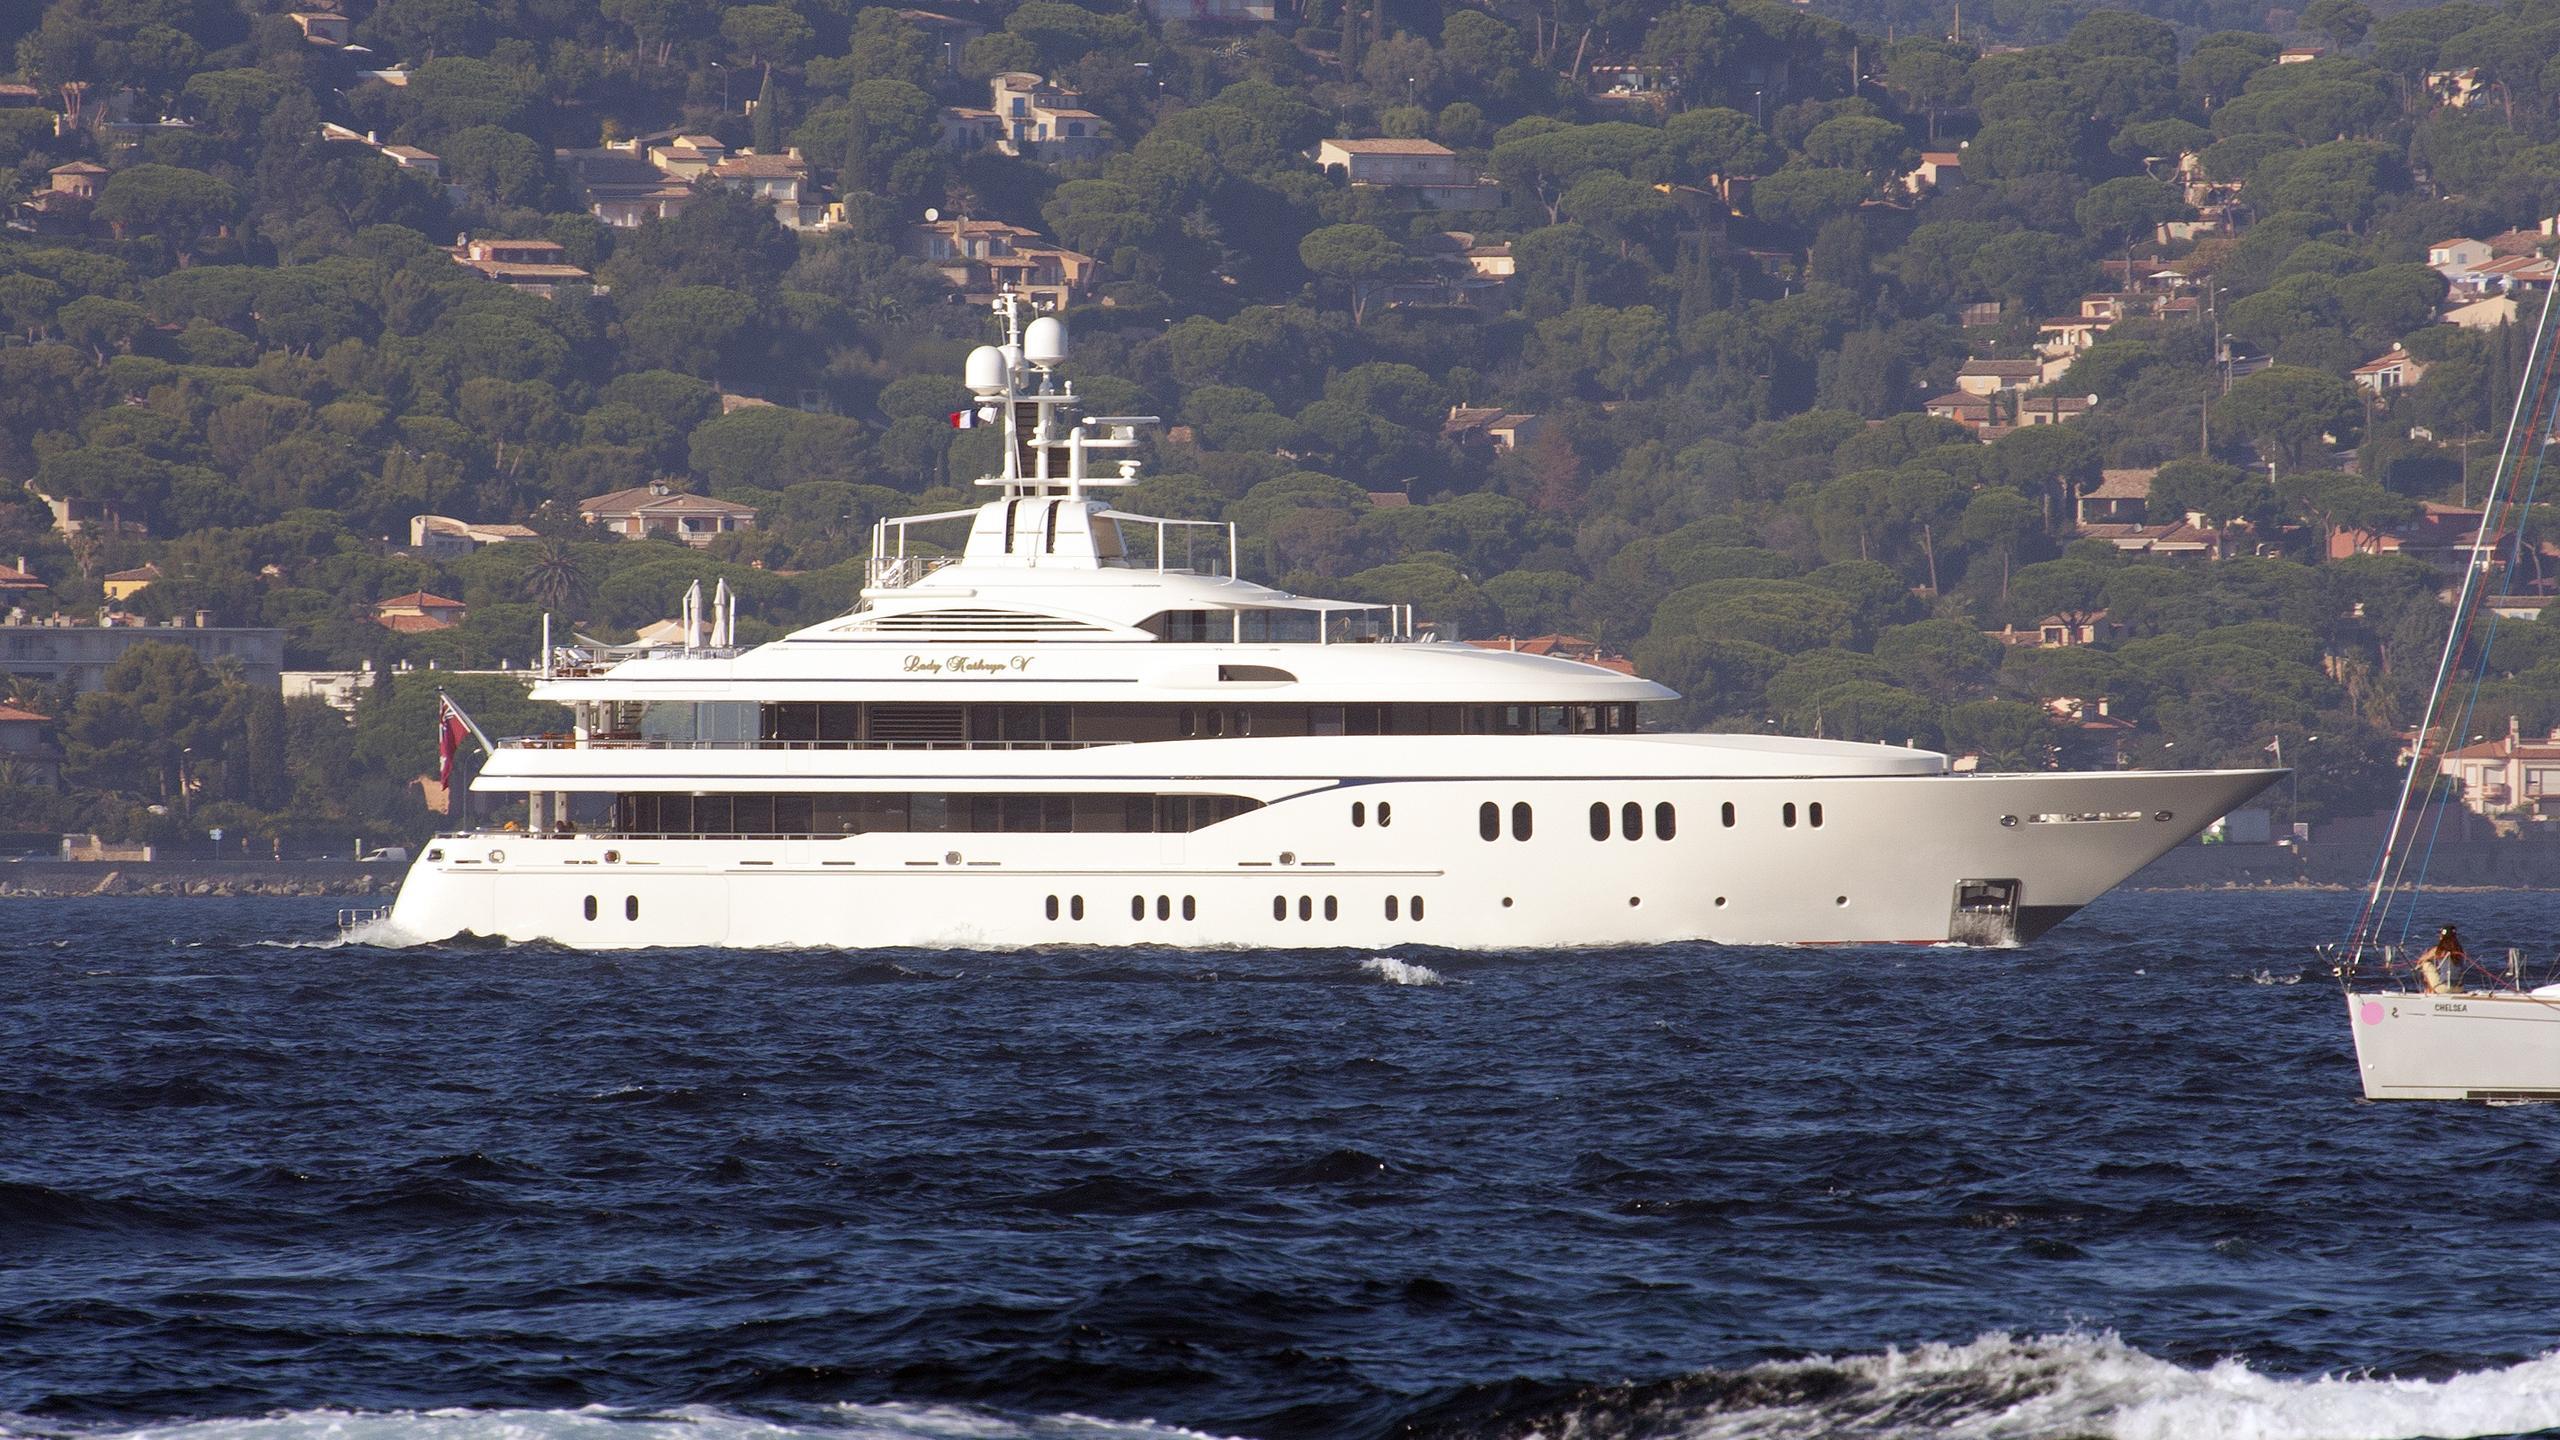 lady-kathryn-v-yacht-exterior